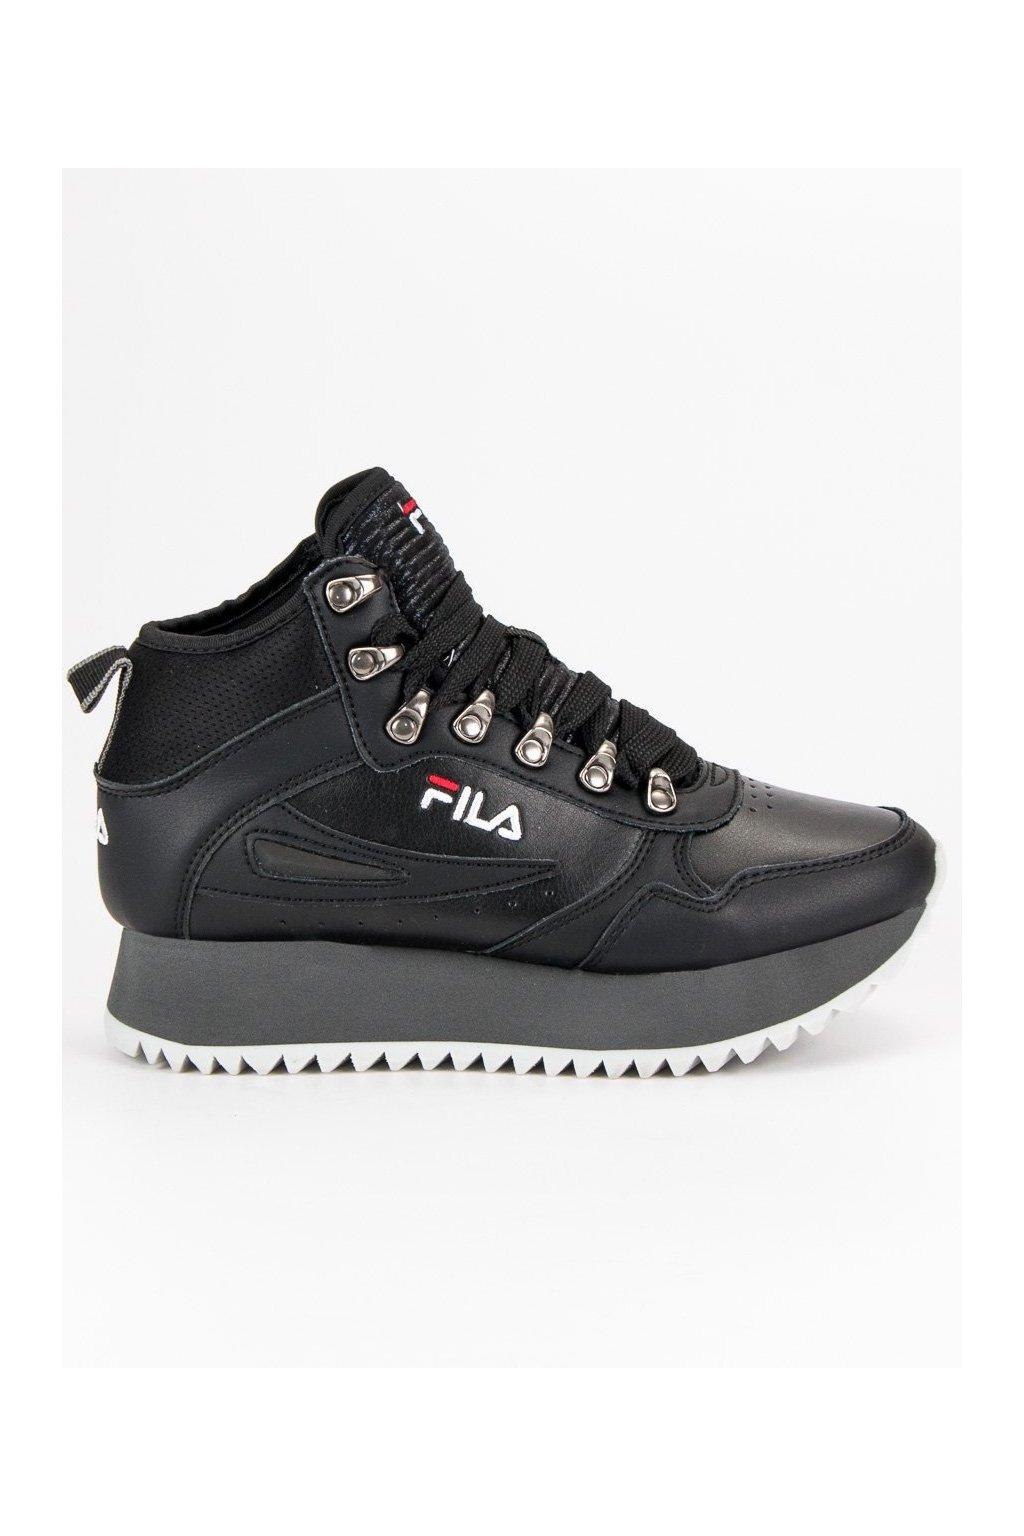 9d0c9a204e9cf Dámske kožené topánky FILA ORBIT ZEPPA RIPPLE čierna